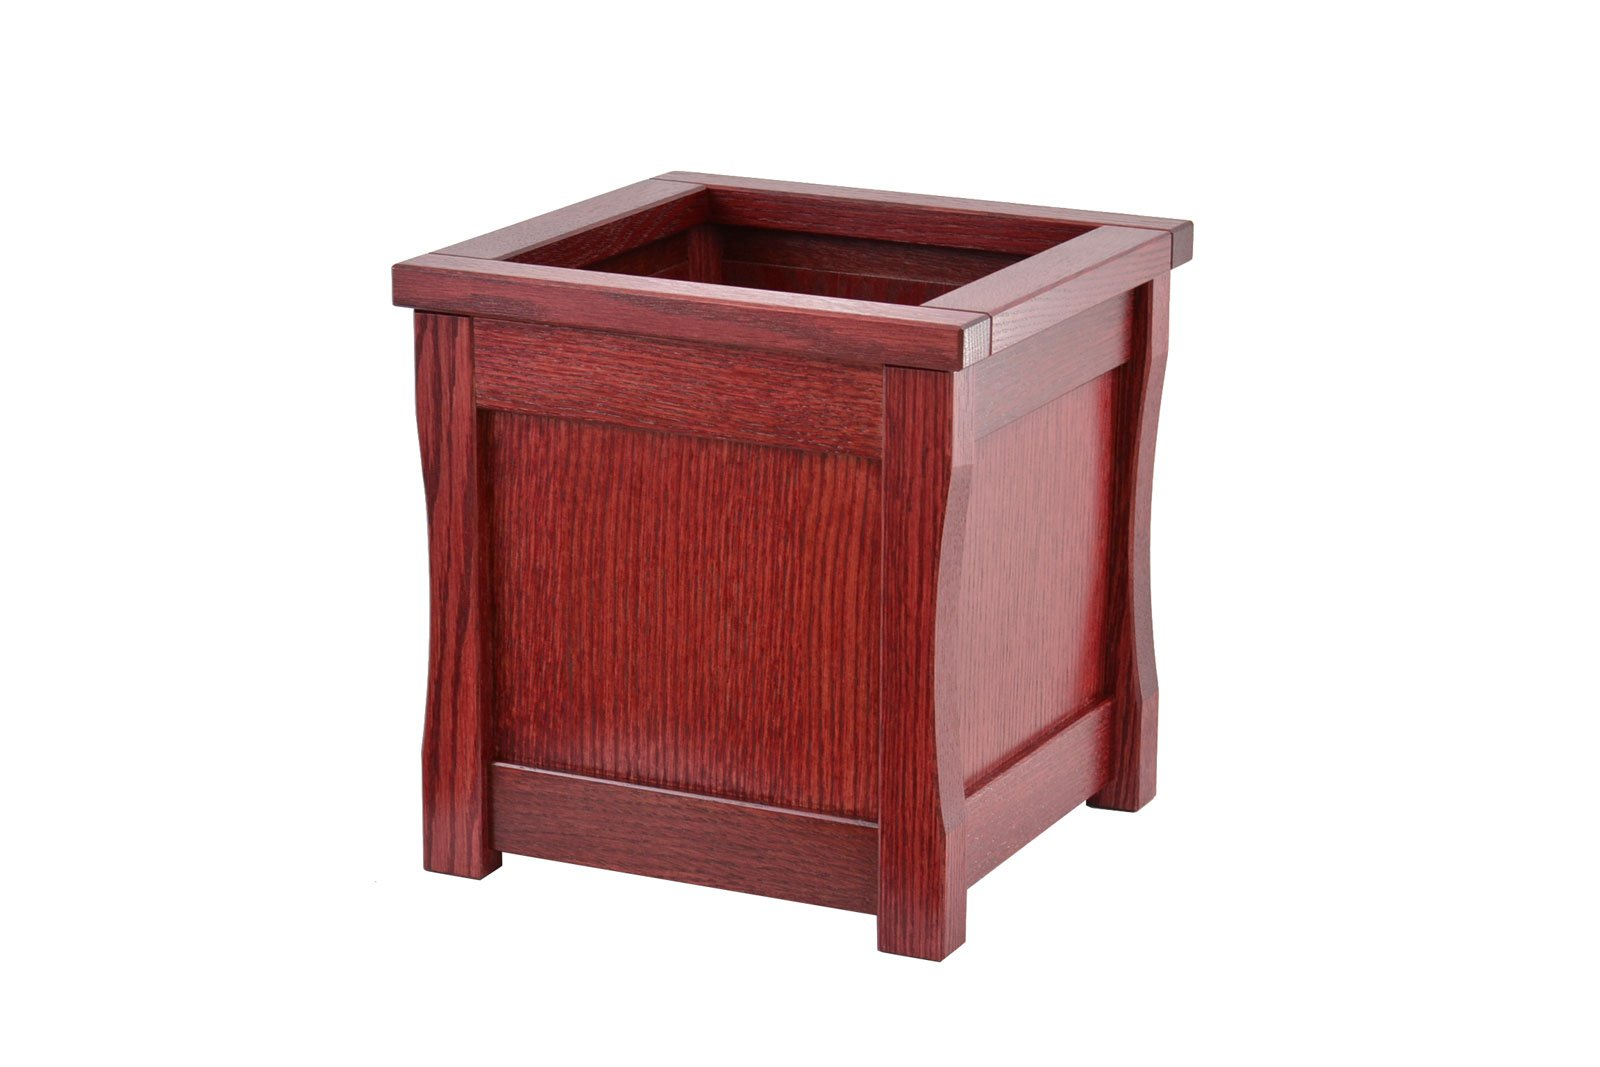 Medium wooden trash can. Mission style. Oak. TE-1366